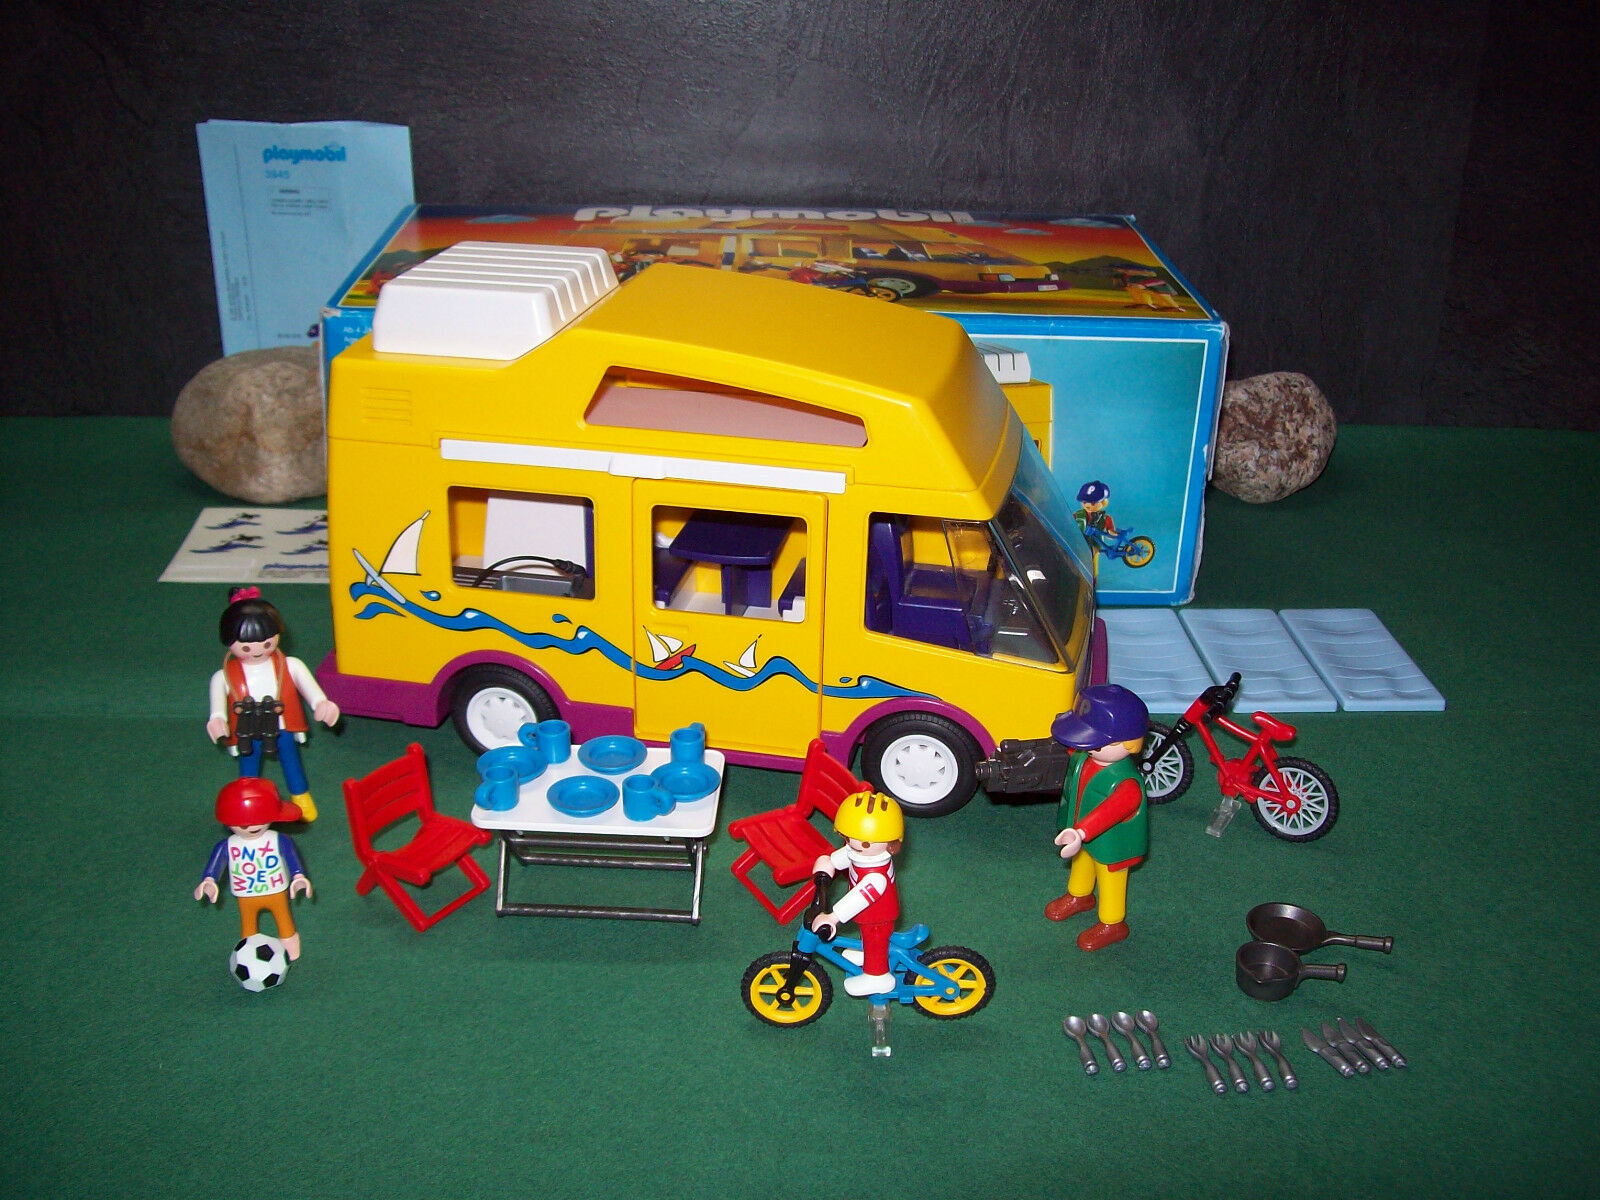 Playmobil Camper 3945-A 1997 mit Orig.-BA und OVP